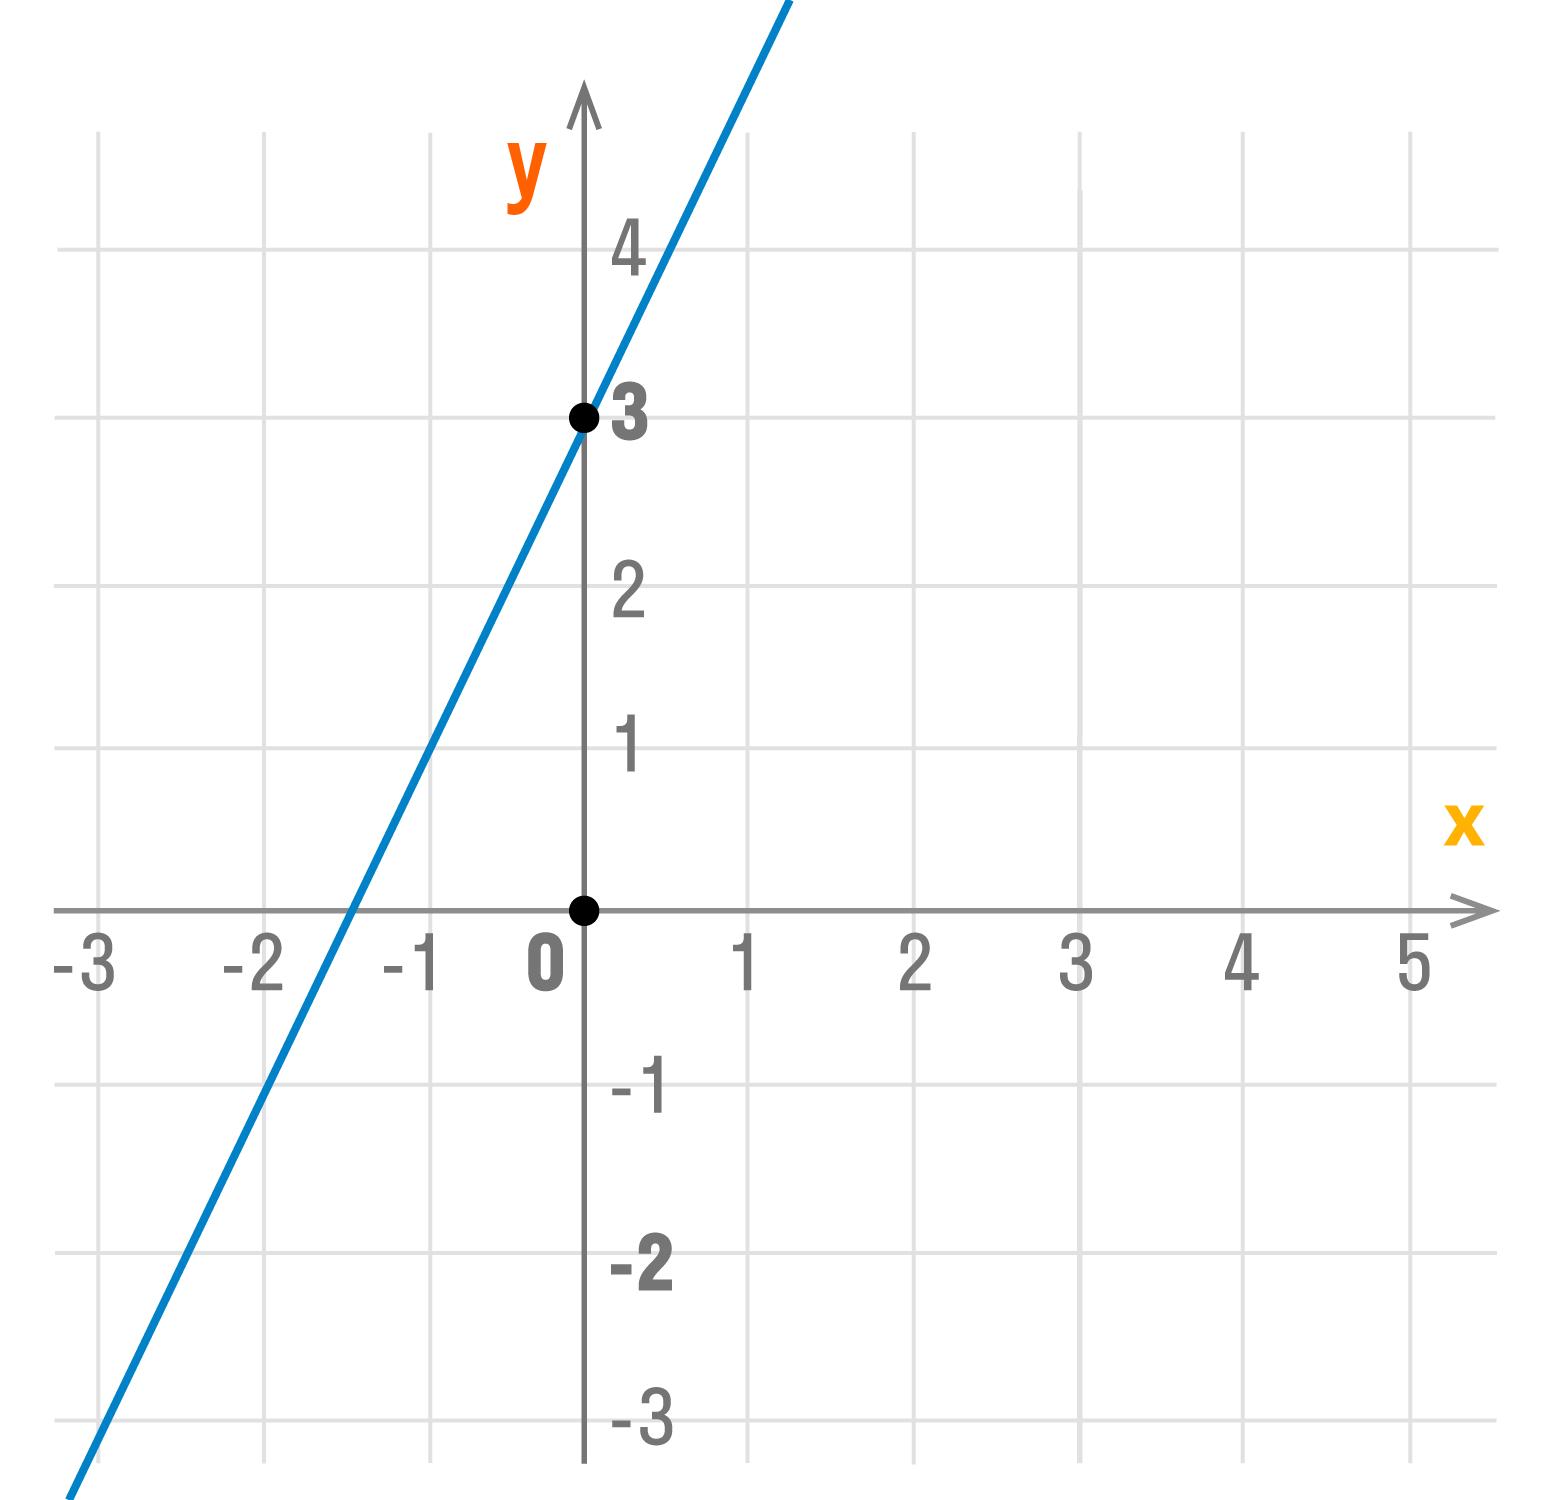 график функции y = kx + b при k > 0 и b > 0